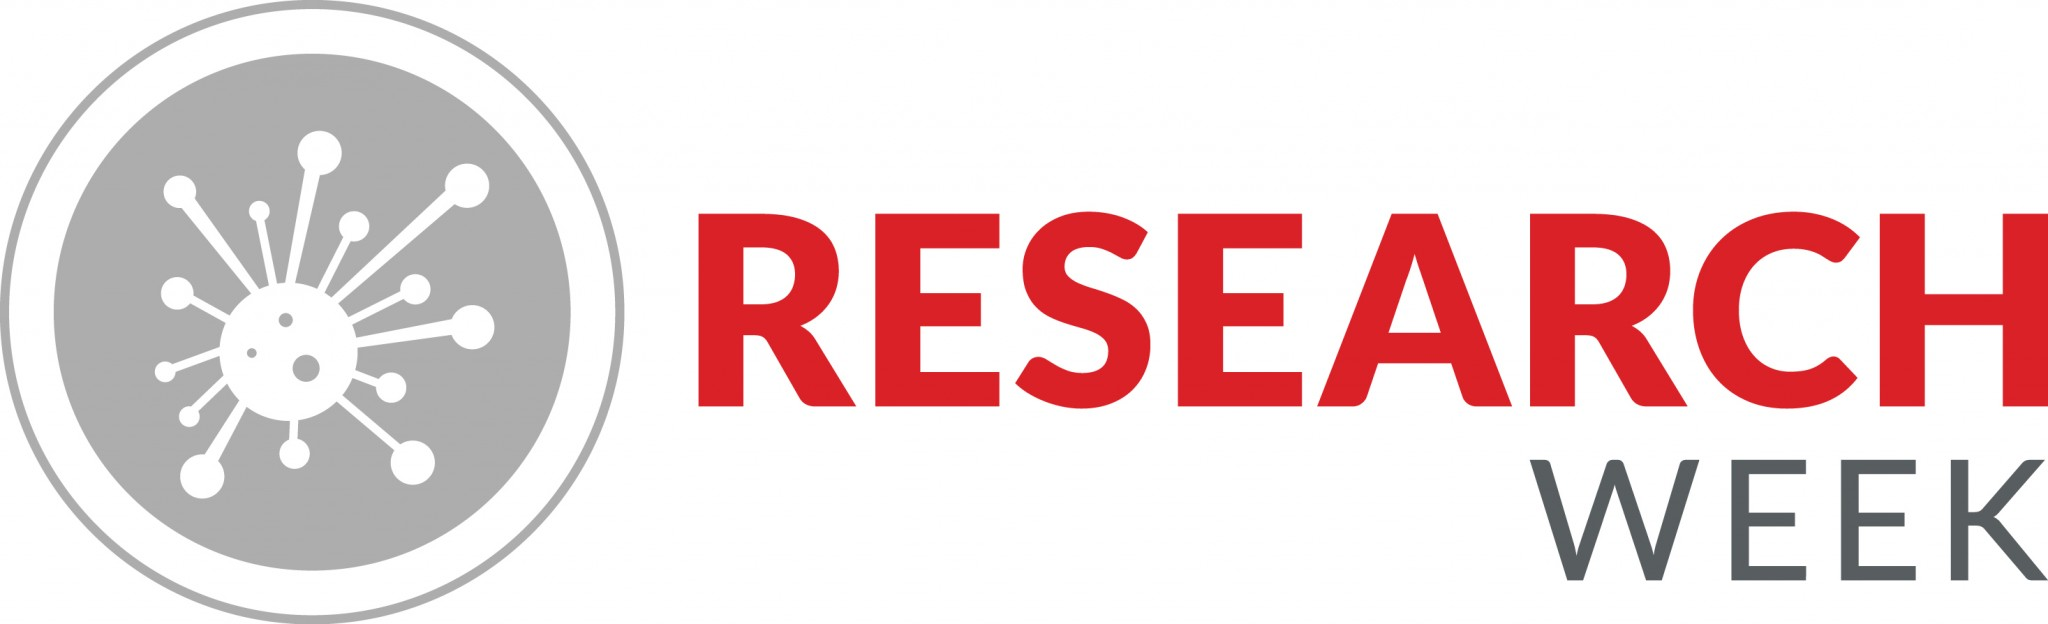 ResearchWeekArt2106 FNL RGB